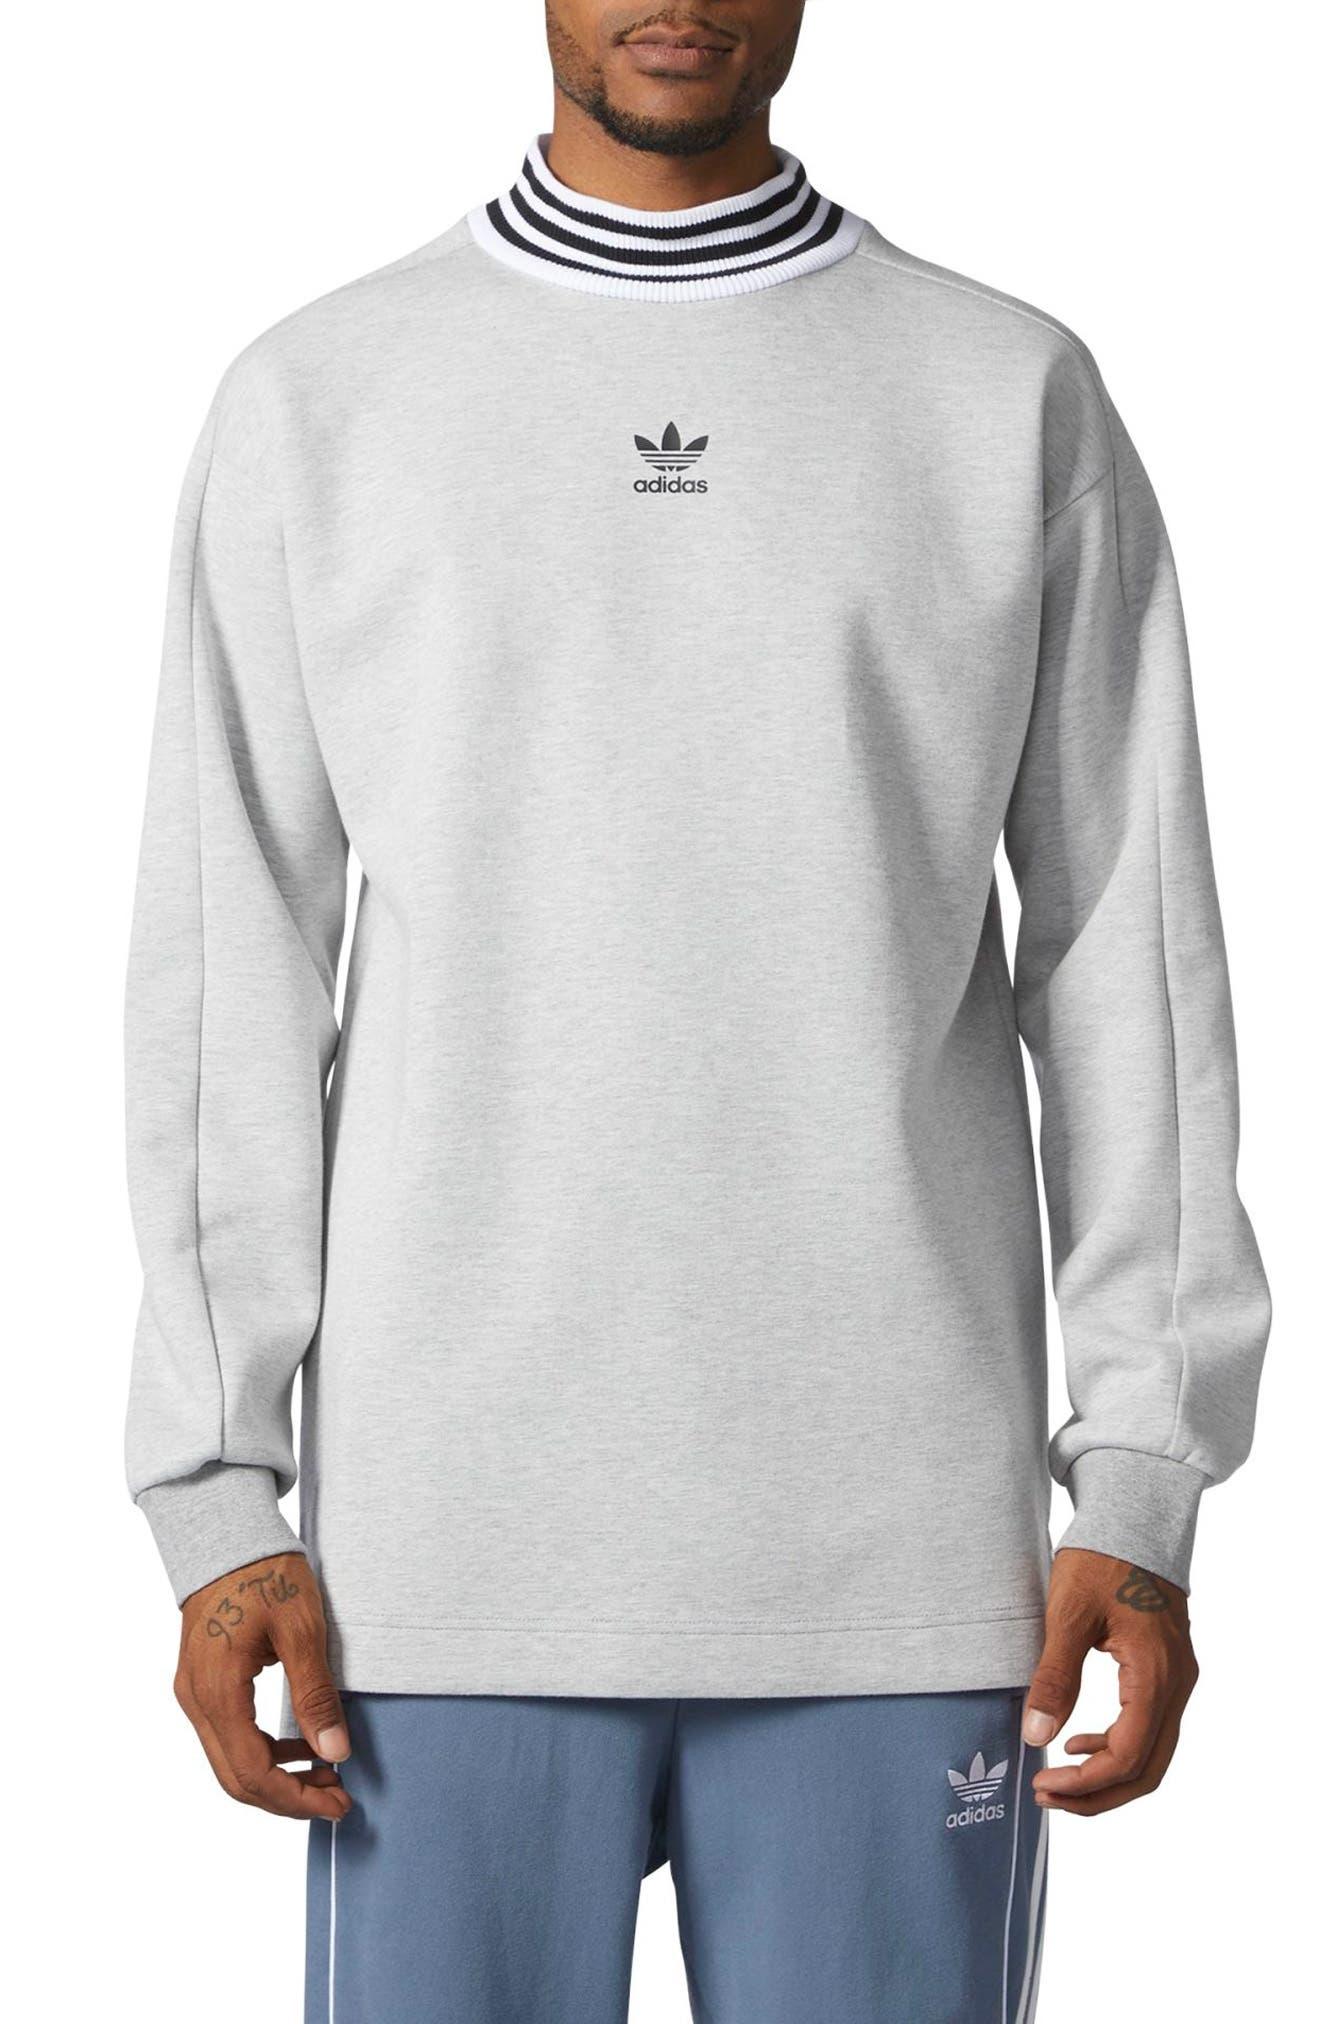 ADIDAS ORIGINALS,                             Mock Neck Sweatshirt,                             Main thumbnail 1, color,                             035